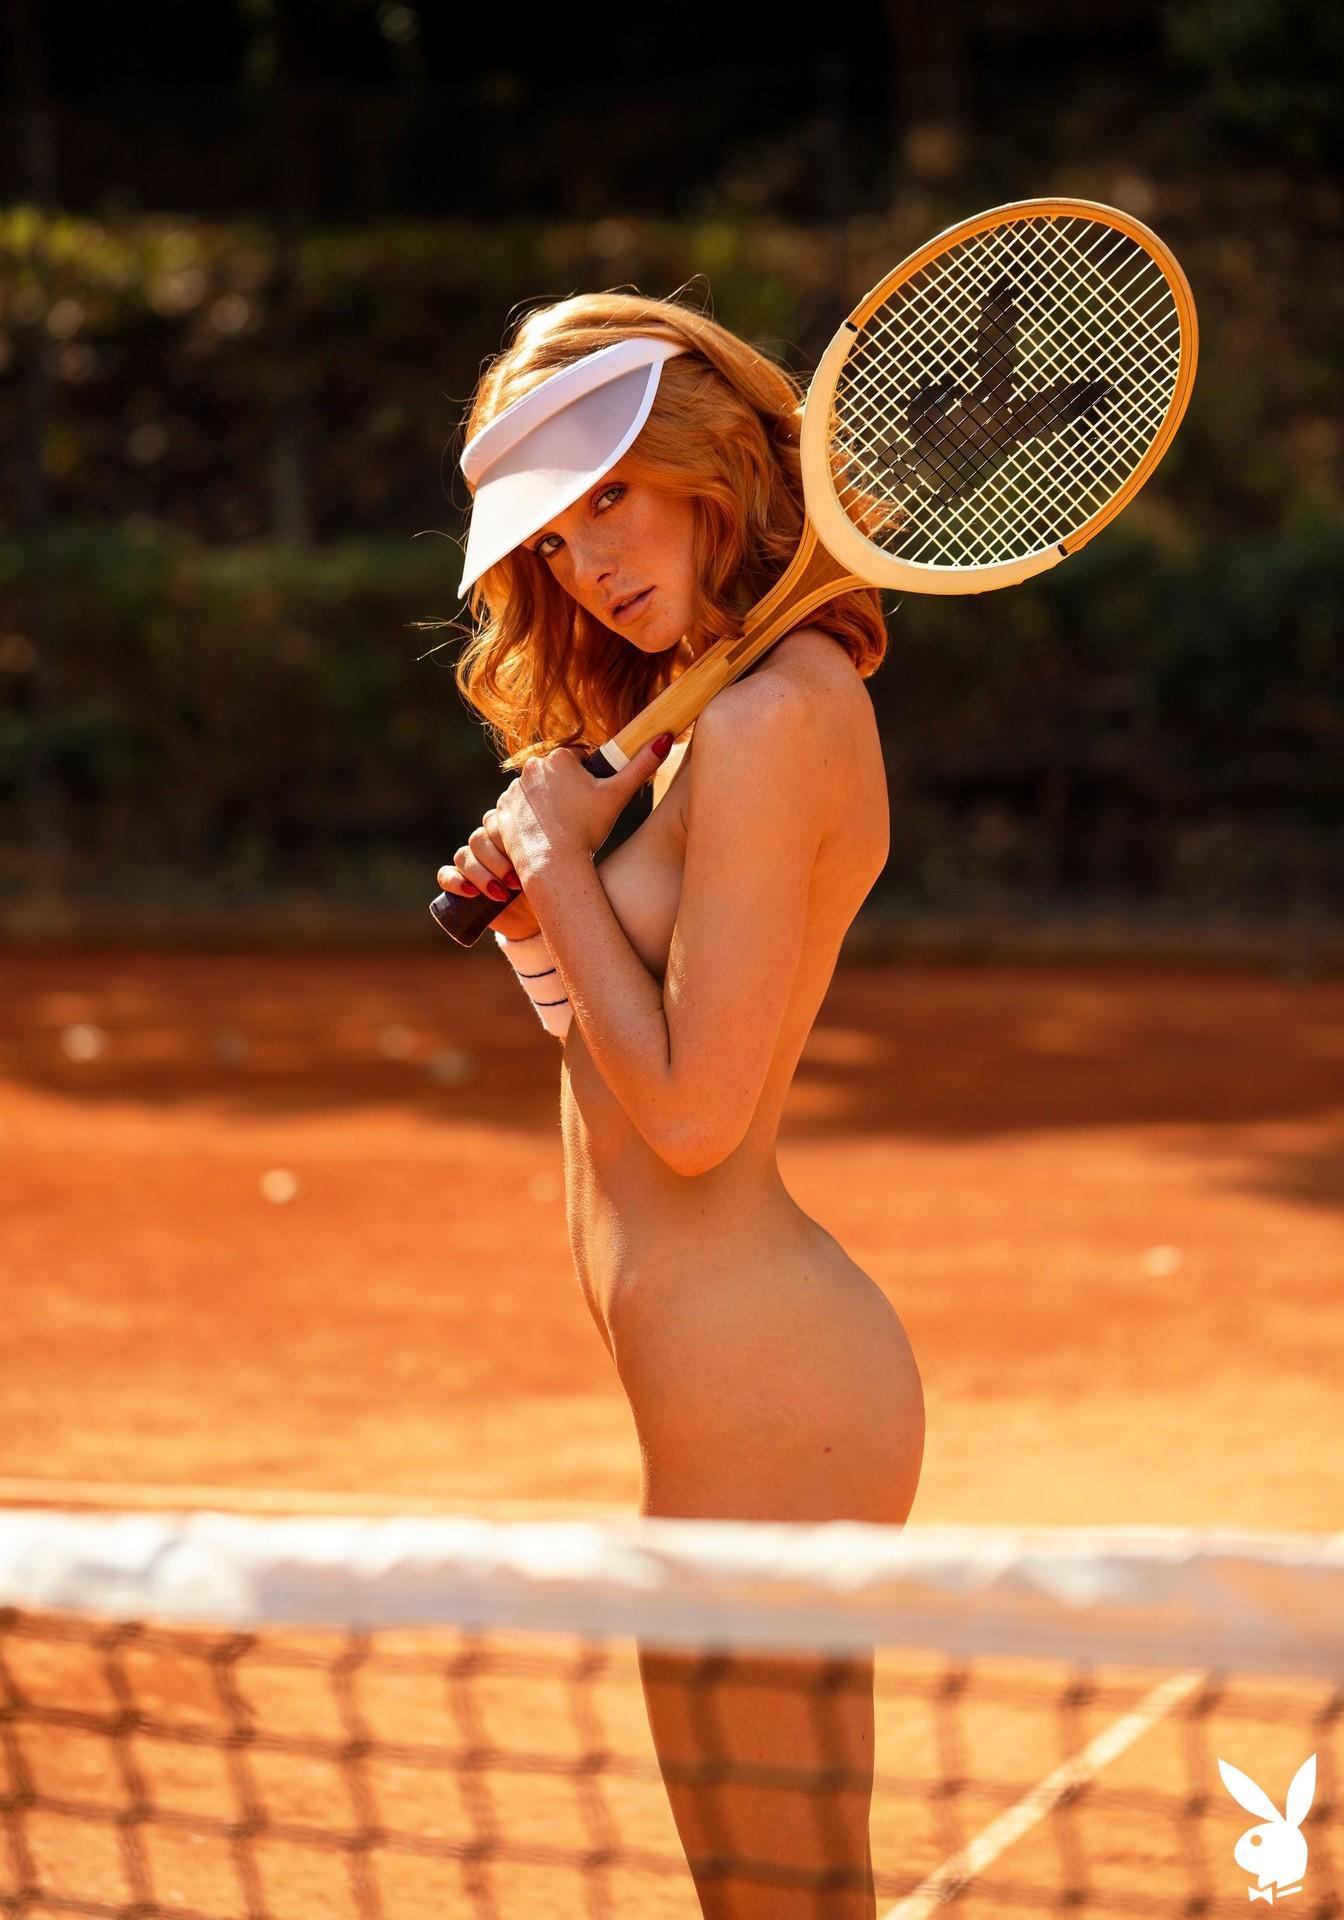 Svenja For Playboy International Playboy Plus (4)